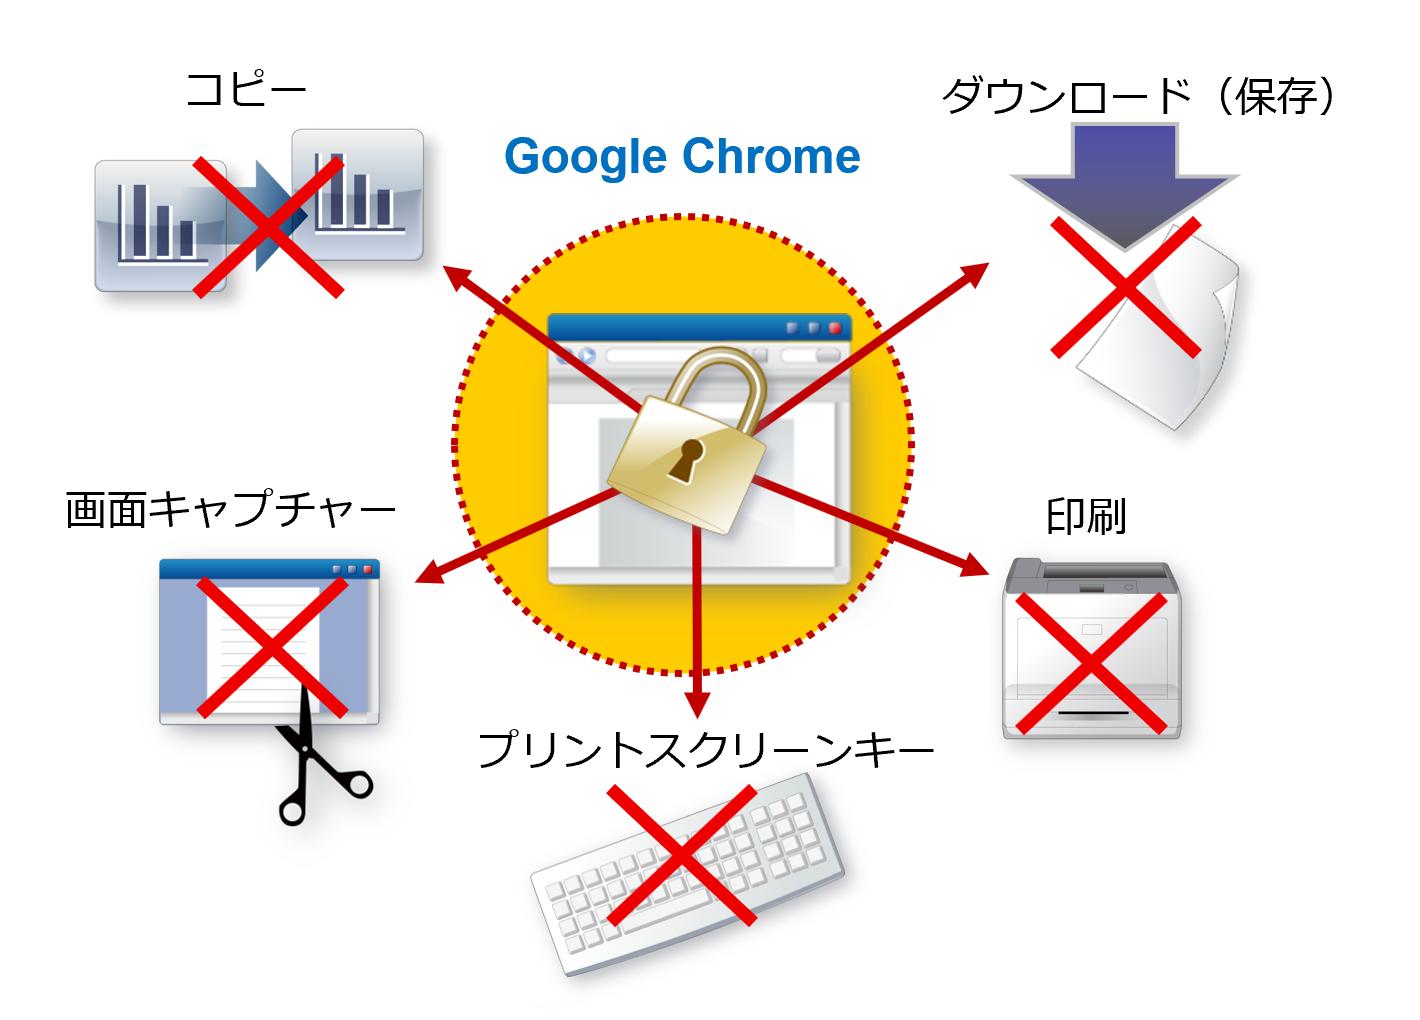 AWPで保護されたWebコンテンツをGoogle Chromeで閲覧